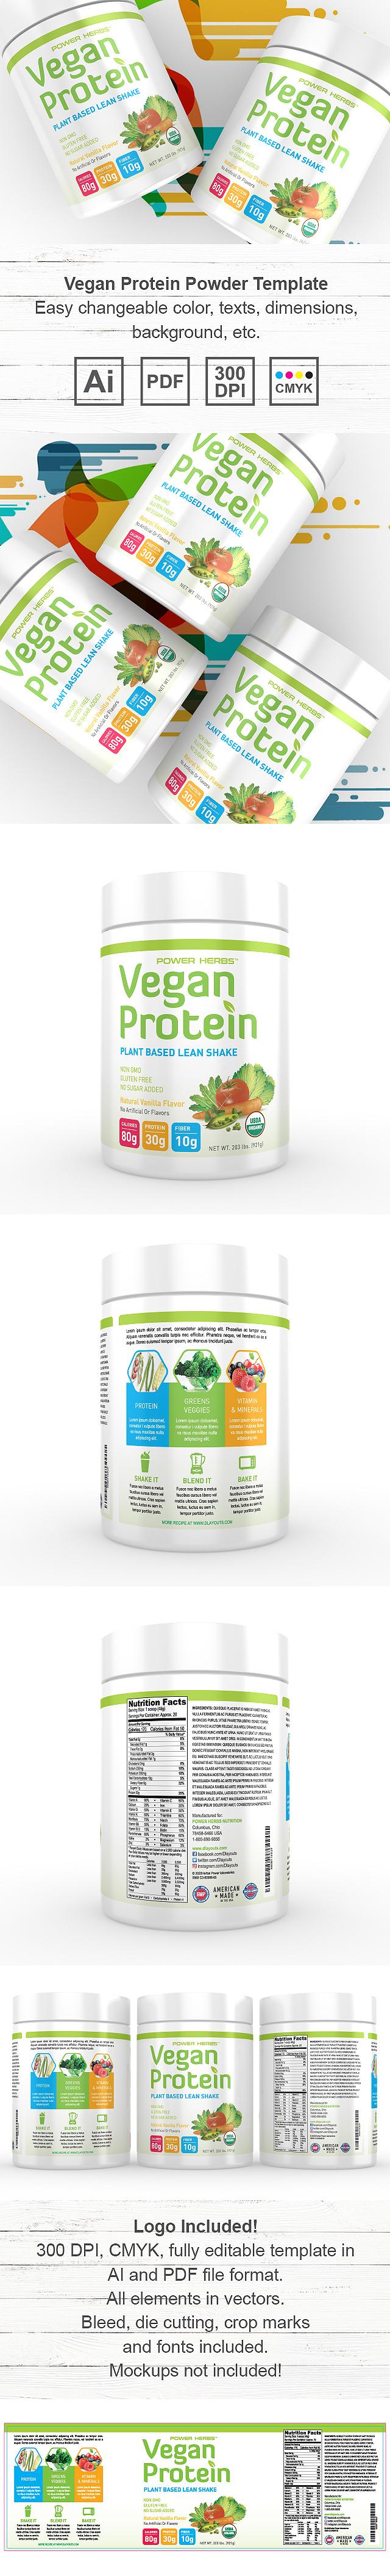 Vegan Plant Protein Powder Supplement Label Template